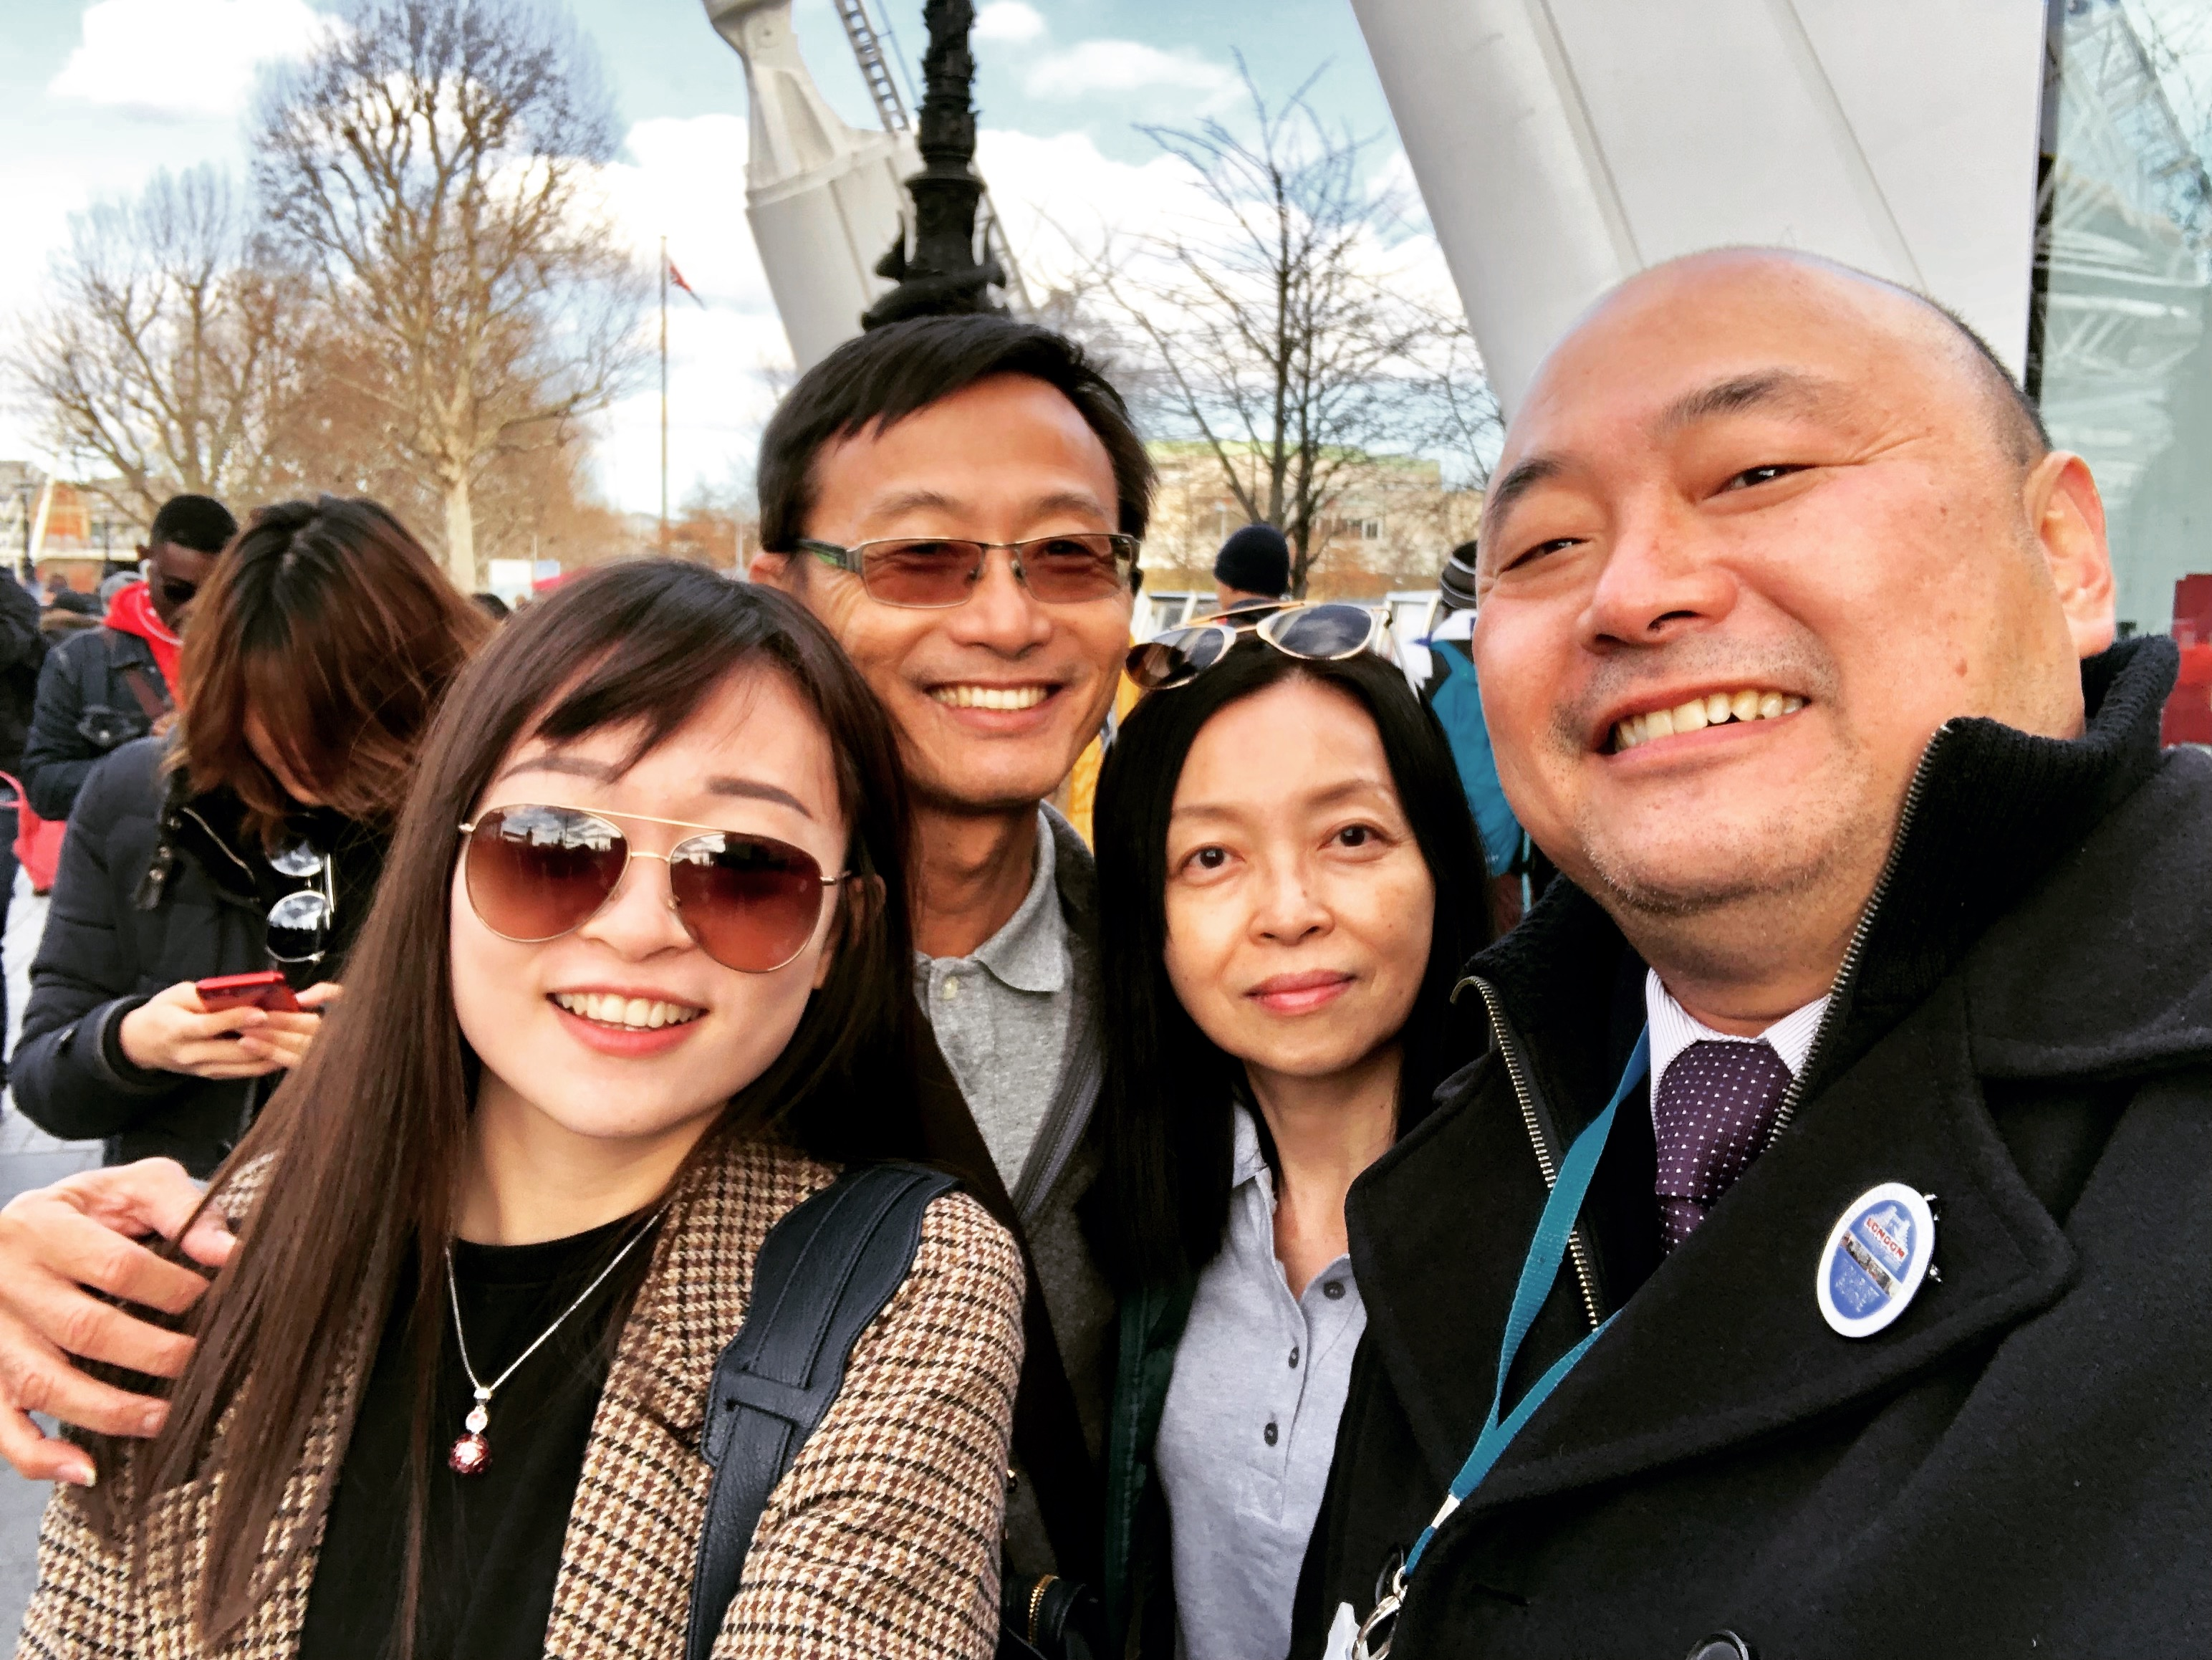 Koh Family from Kuantan